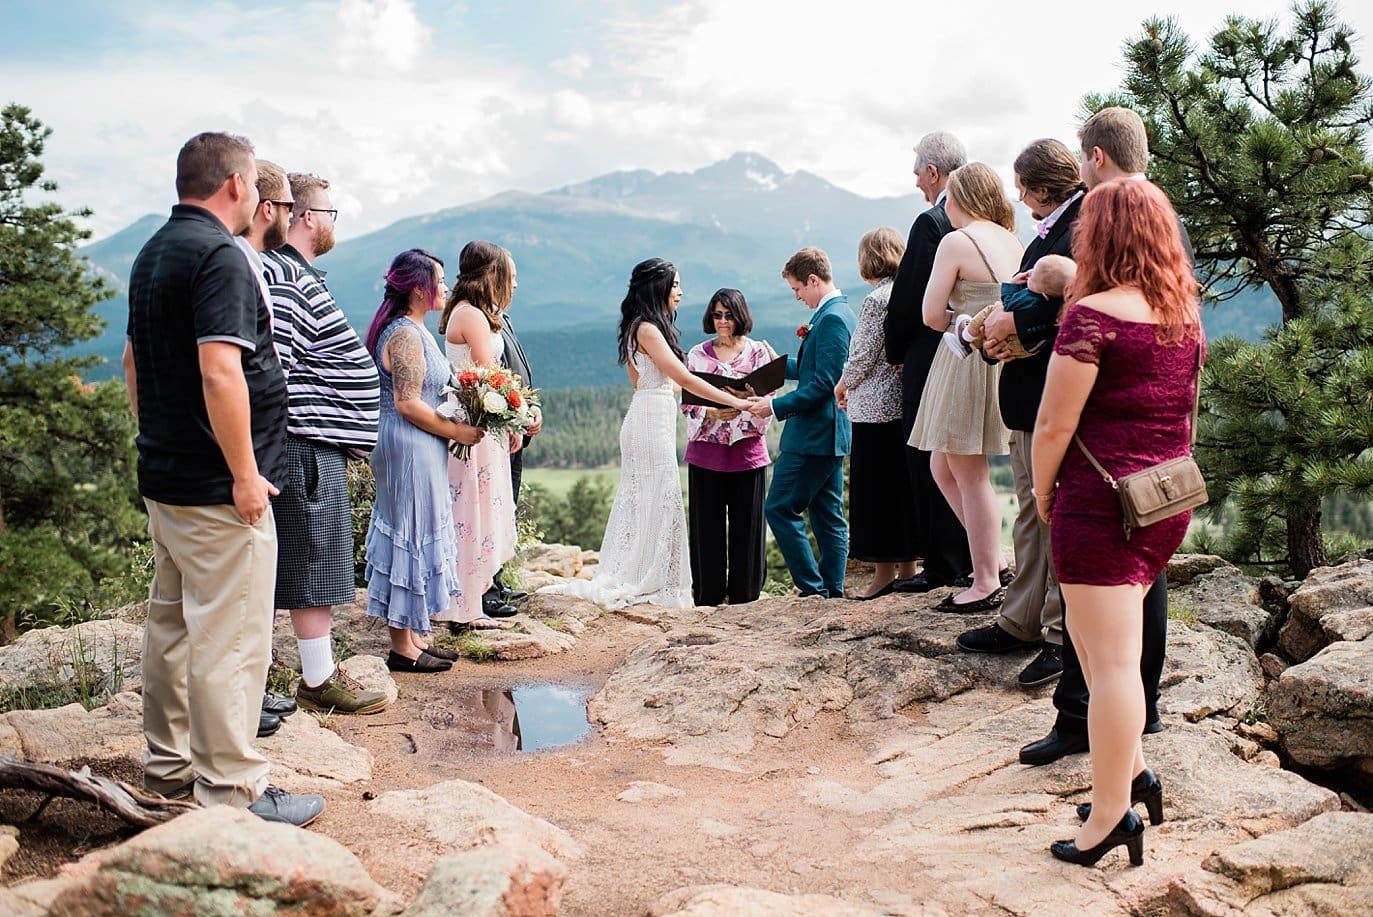 RMNP 3M Curve Wedding ceremony  at Rocky Mountain National Park Wedding by Denver Wedding Photographer Jennie Crate